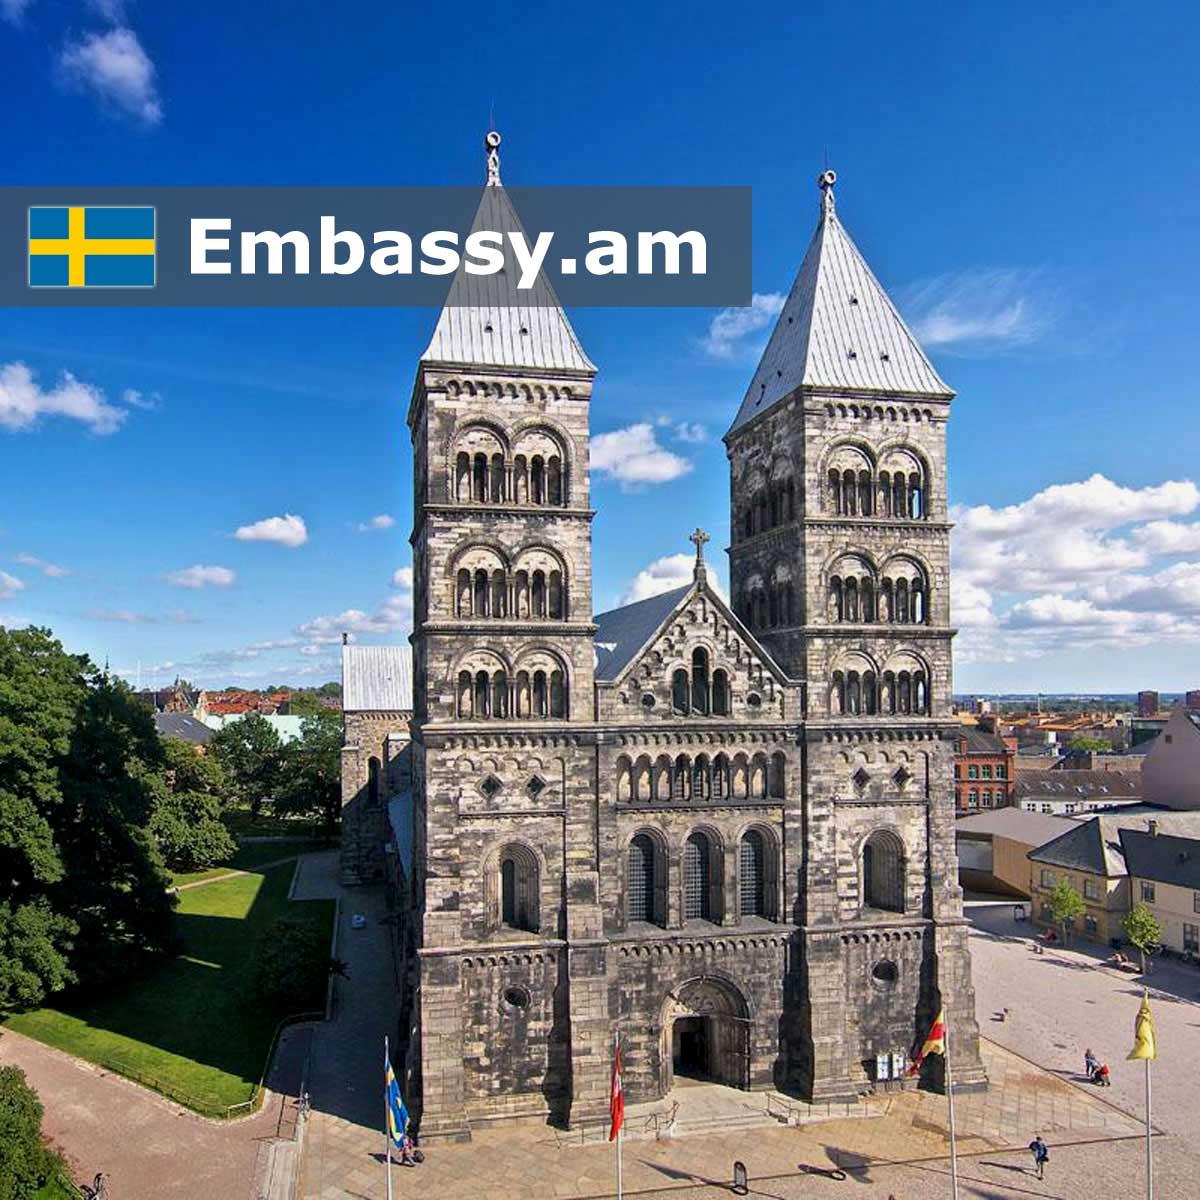 Лунд - Отели в Швеции - Embassy.am